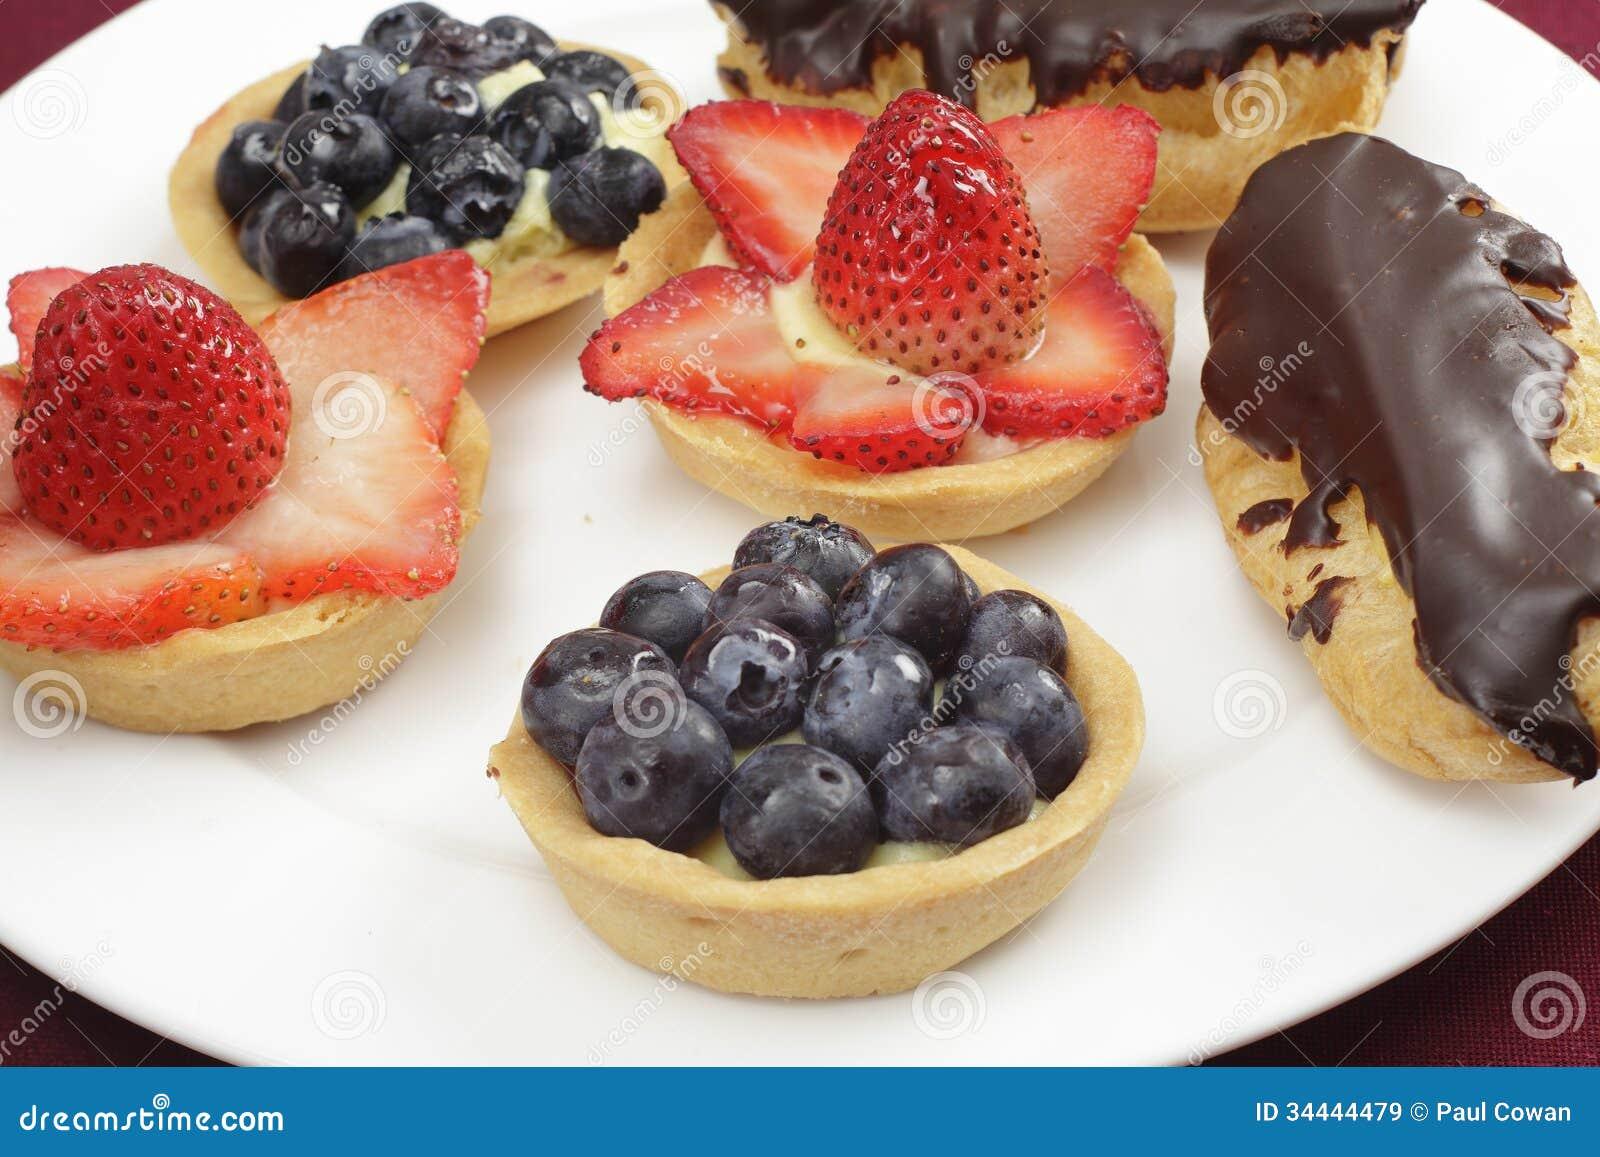 Strawberry And Blueberry Tarts Recipes — Dishmaps